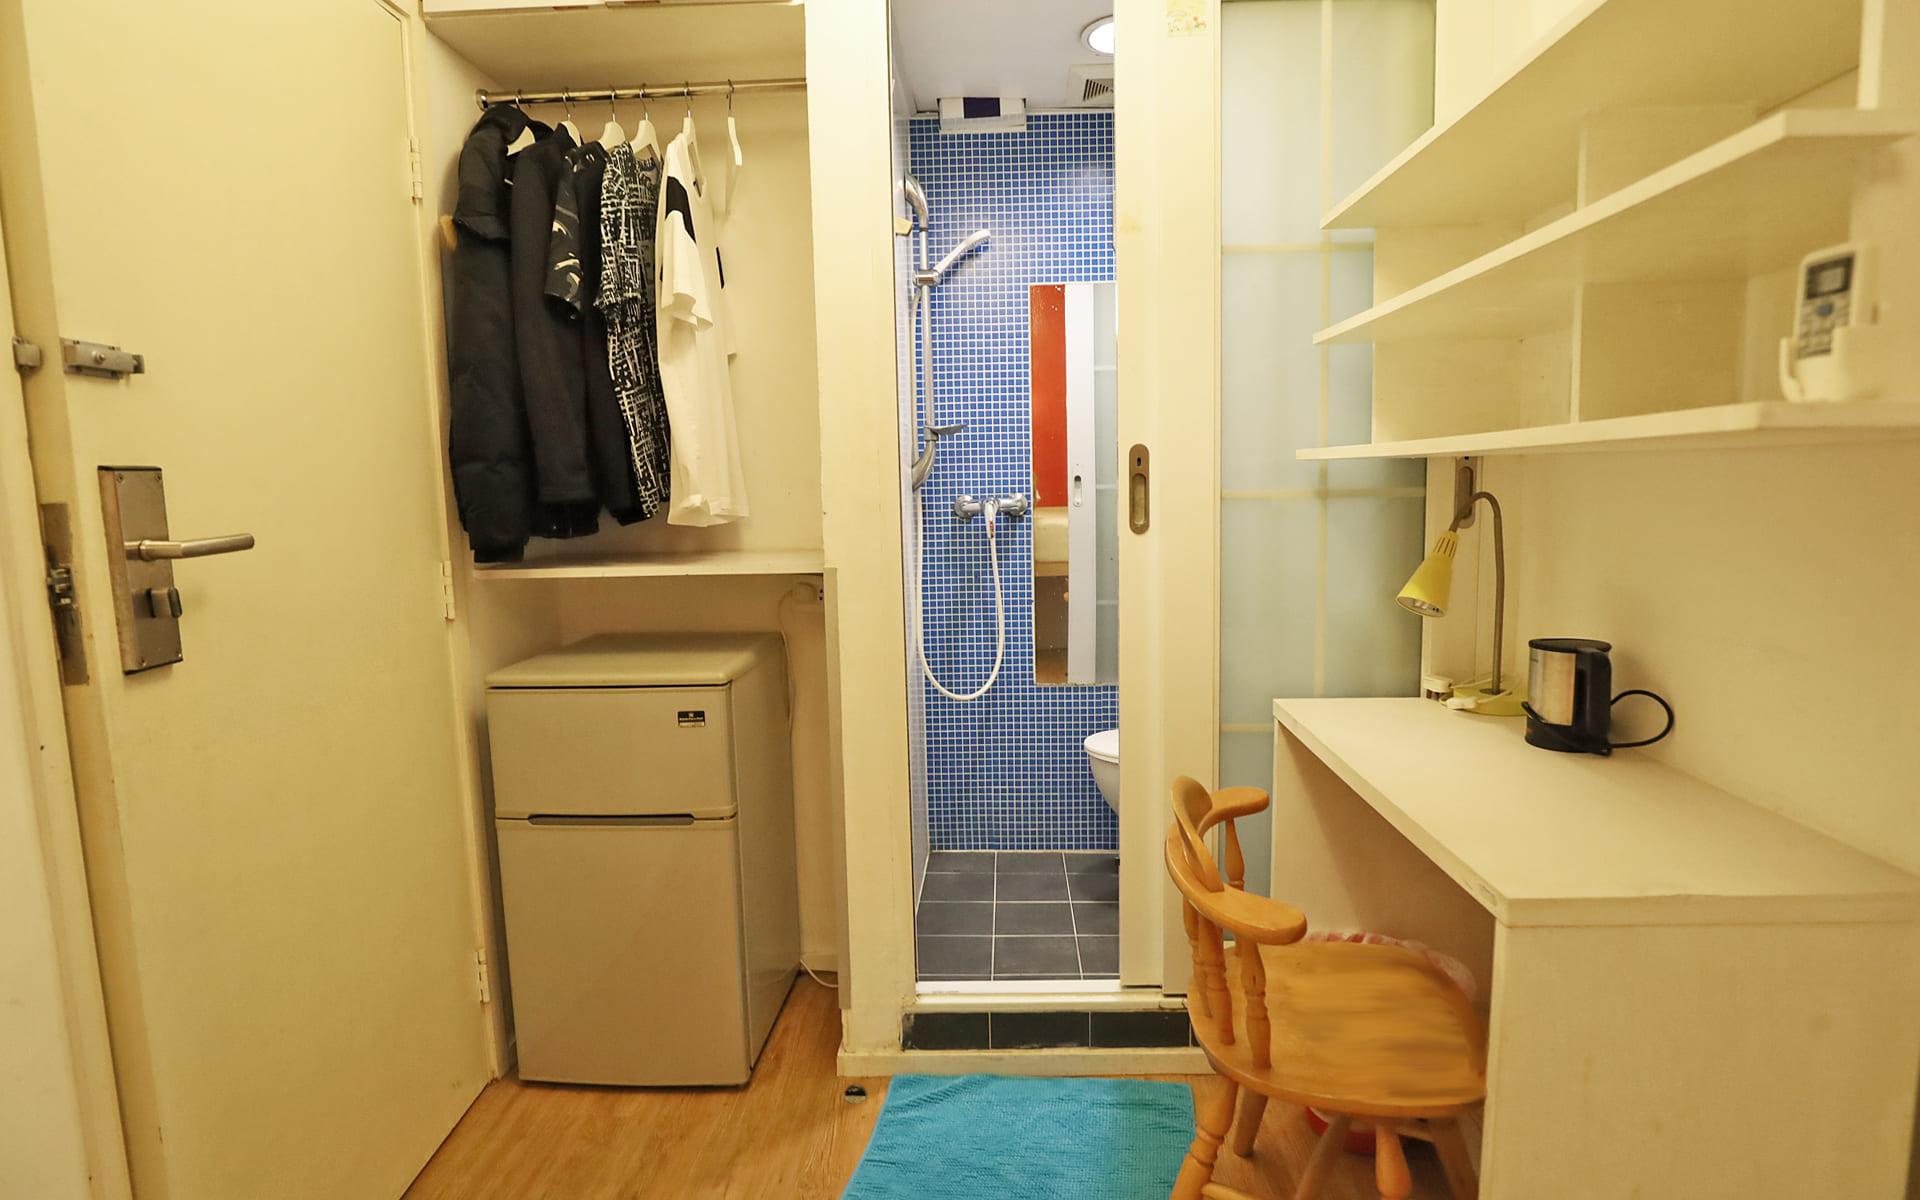 hk_service_apartment_14089578441596886749.jpg